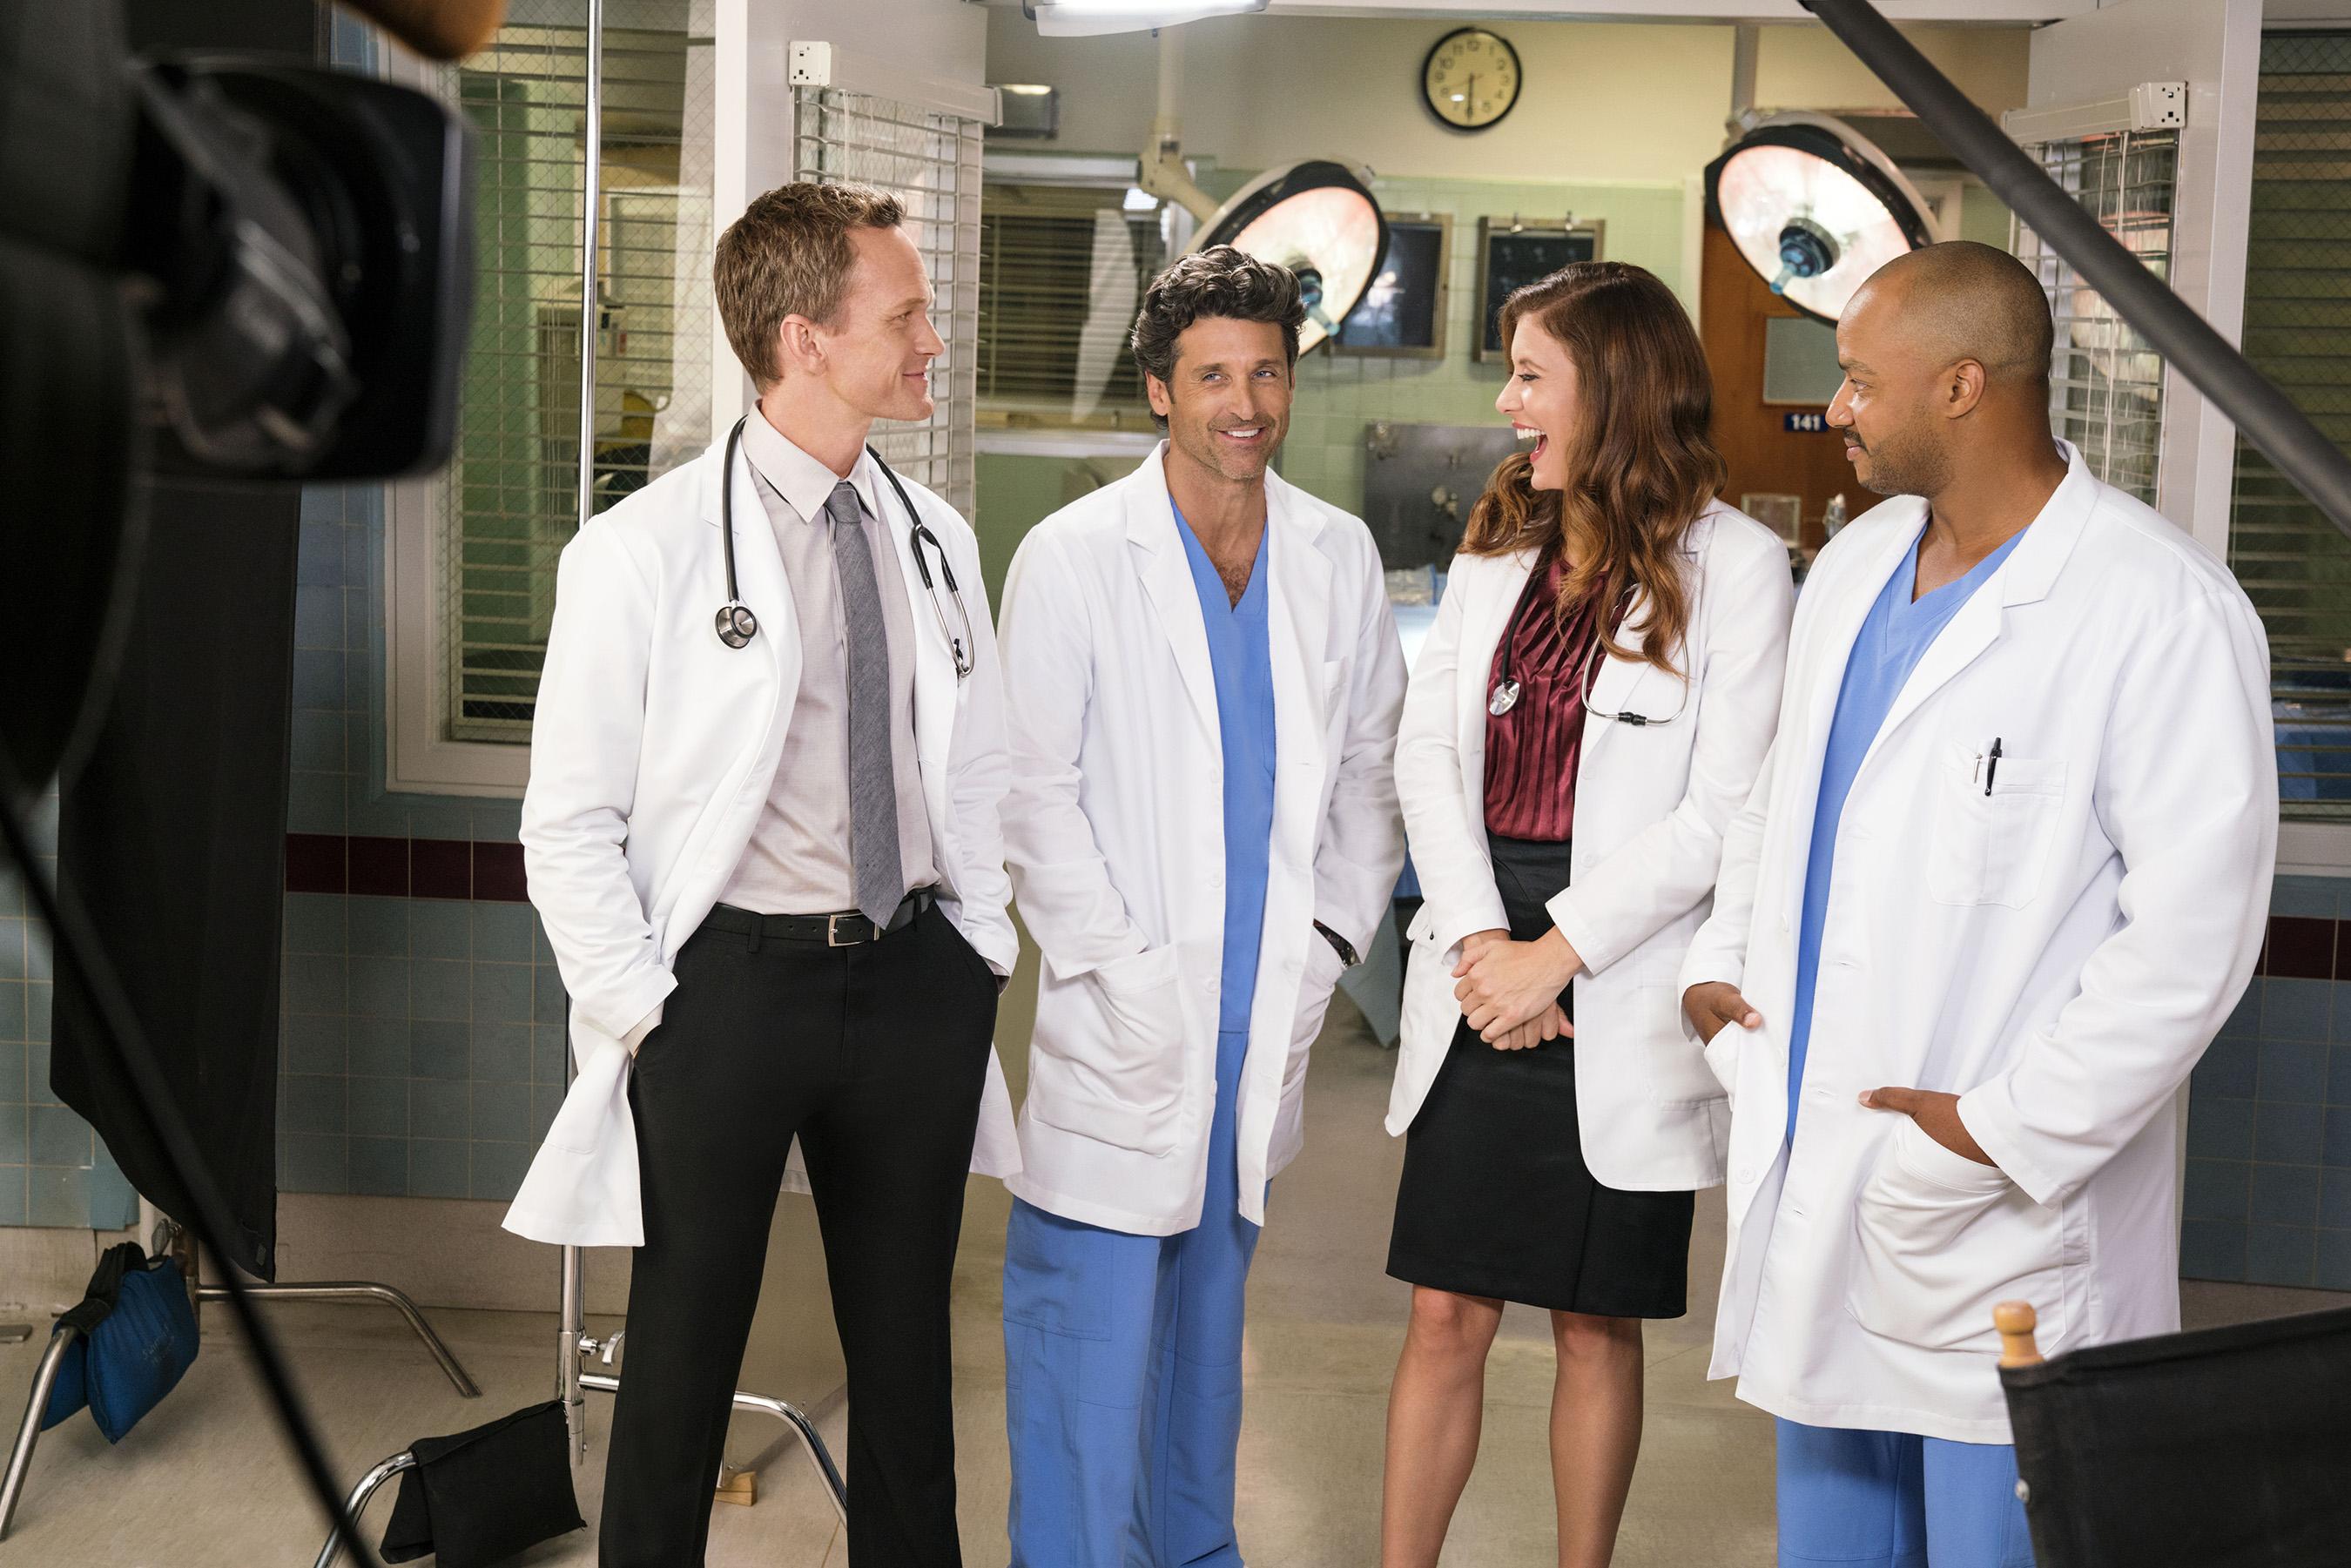 TV Doctors Ensemble Pose